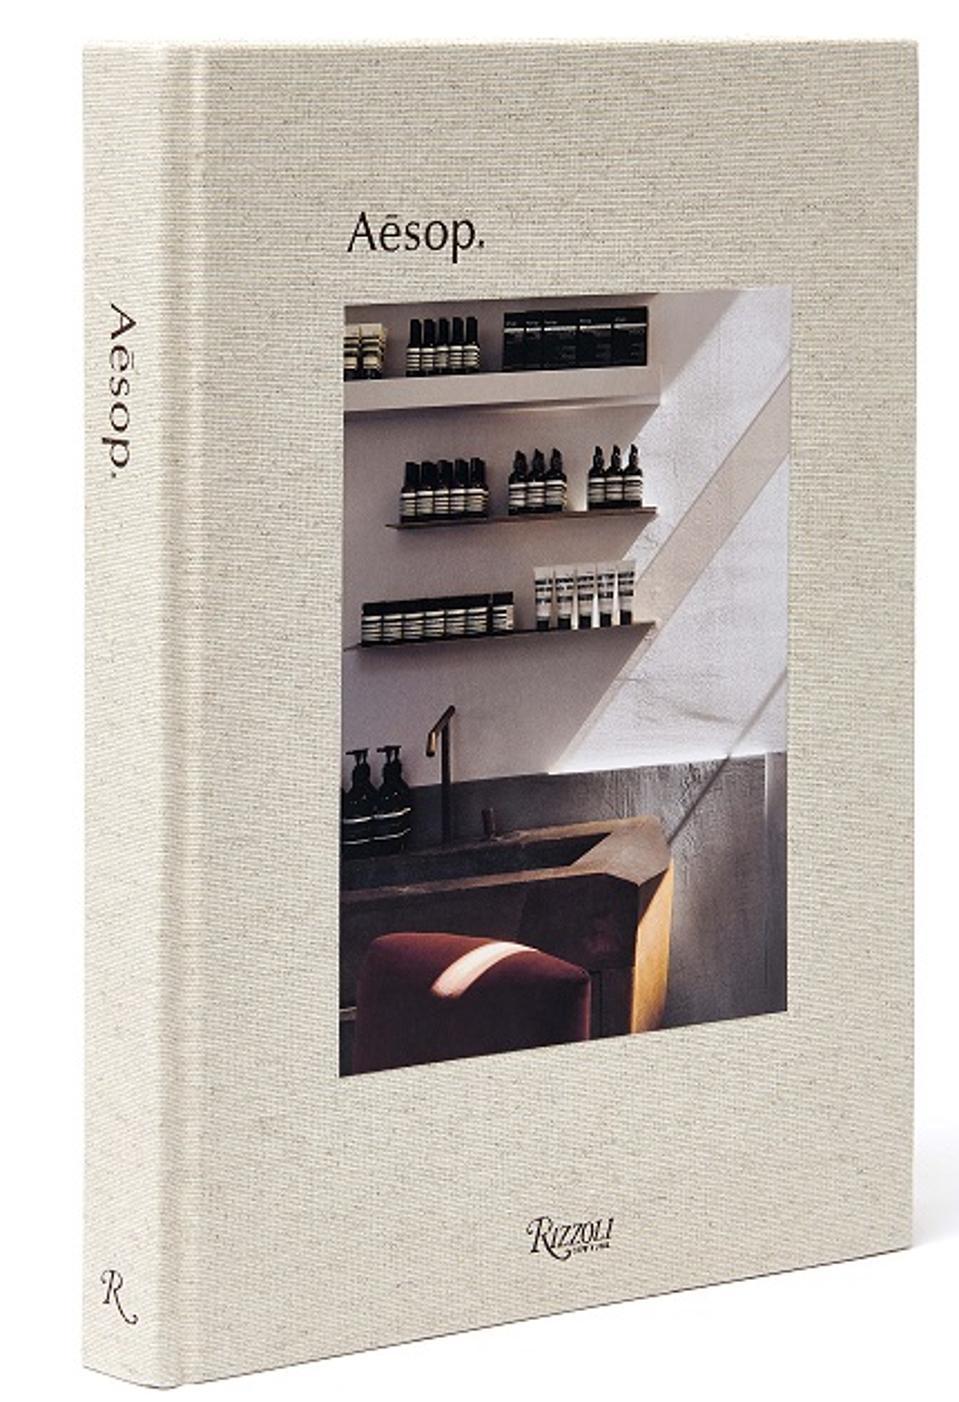 The ″Aesop″ book (Rizzoli)